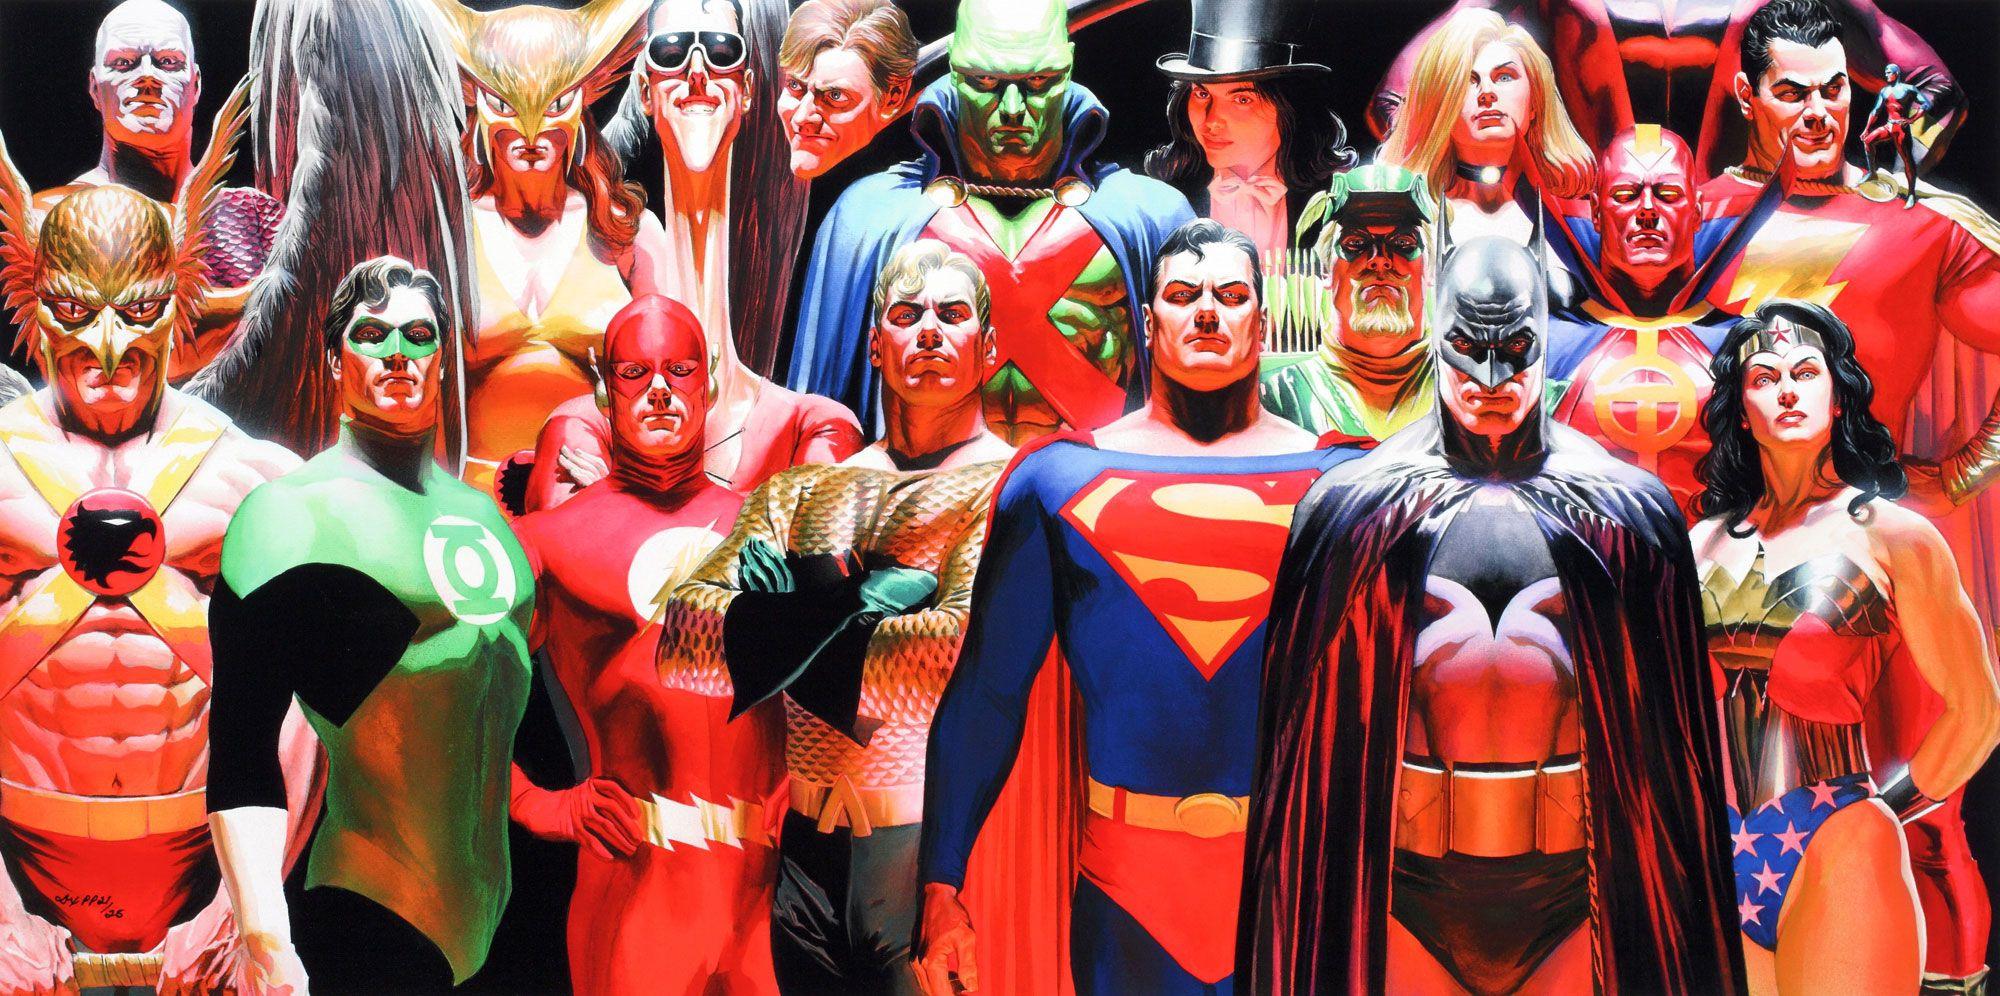 Justice League Dc Comics Superheroes Wallpapers: Superheroes Wallpapers HD Group × DC Superheroes